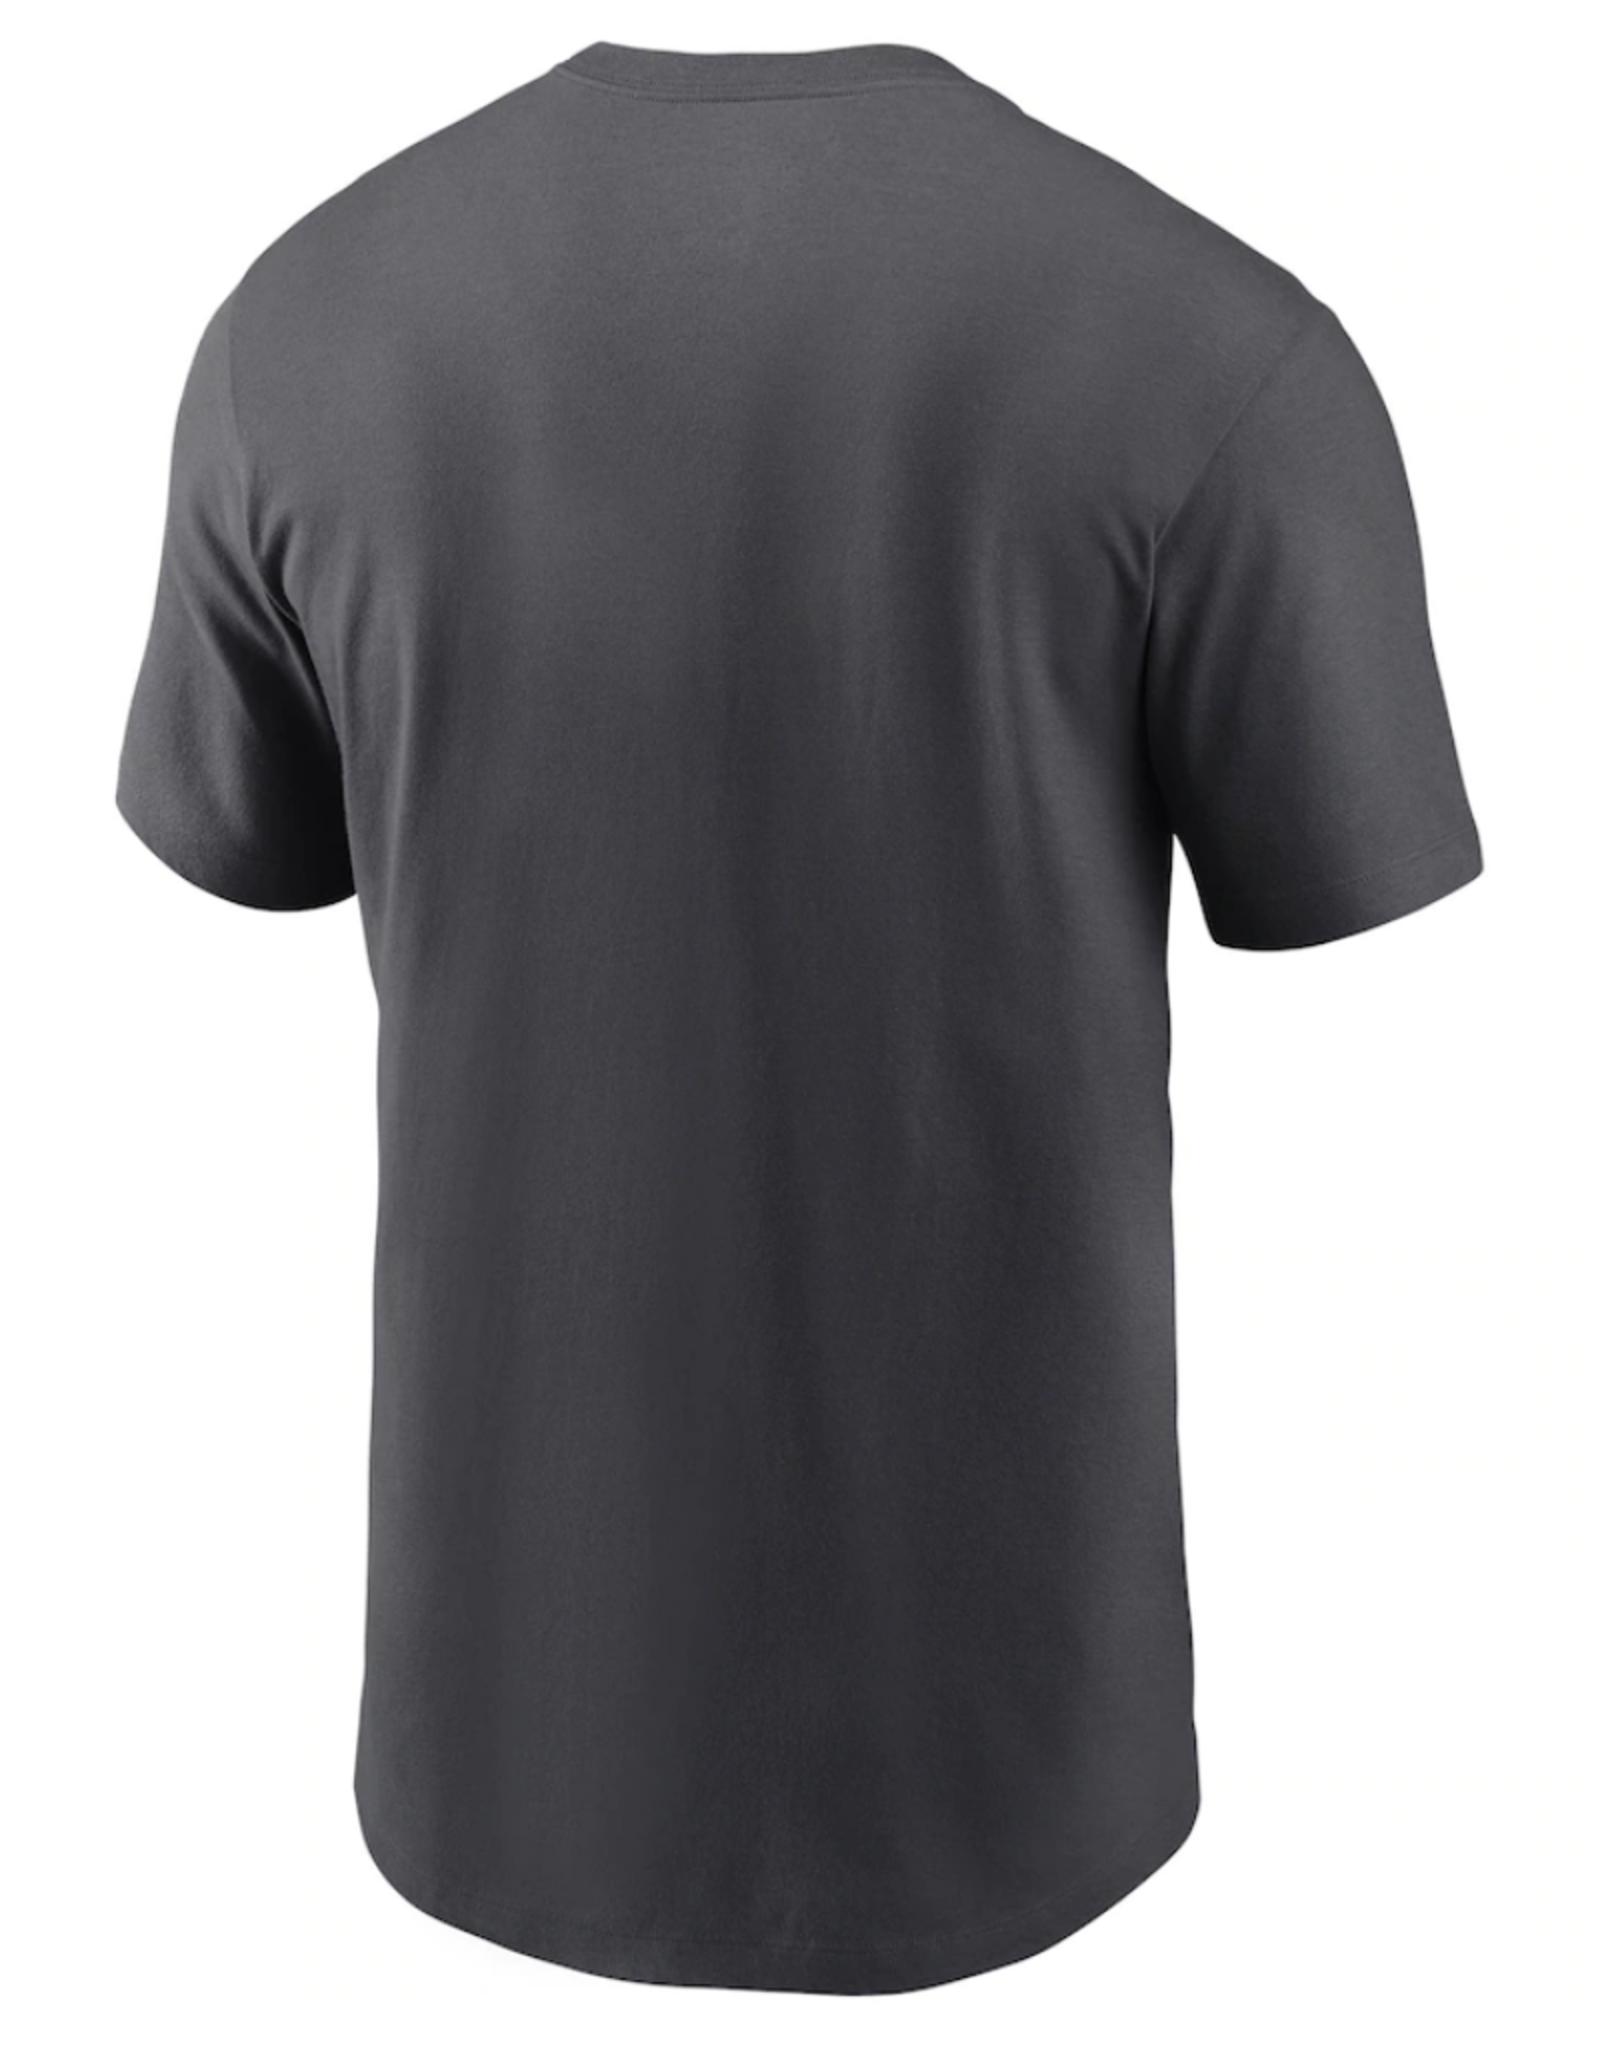 Nike Broadcast T-shirt Kansas City Chiefs Black